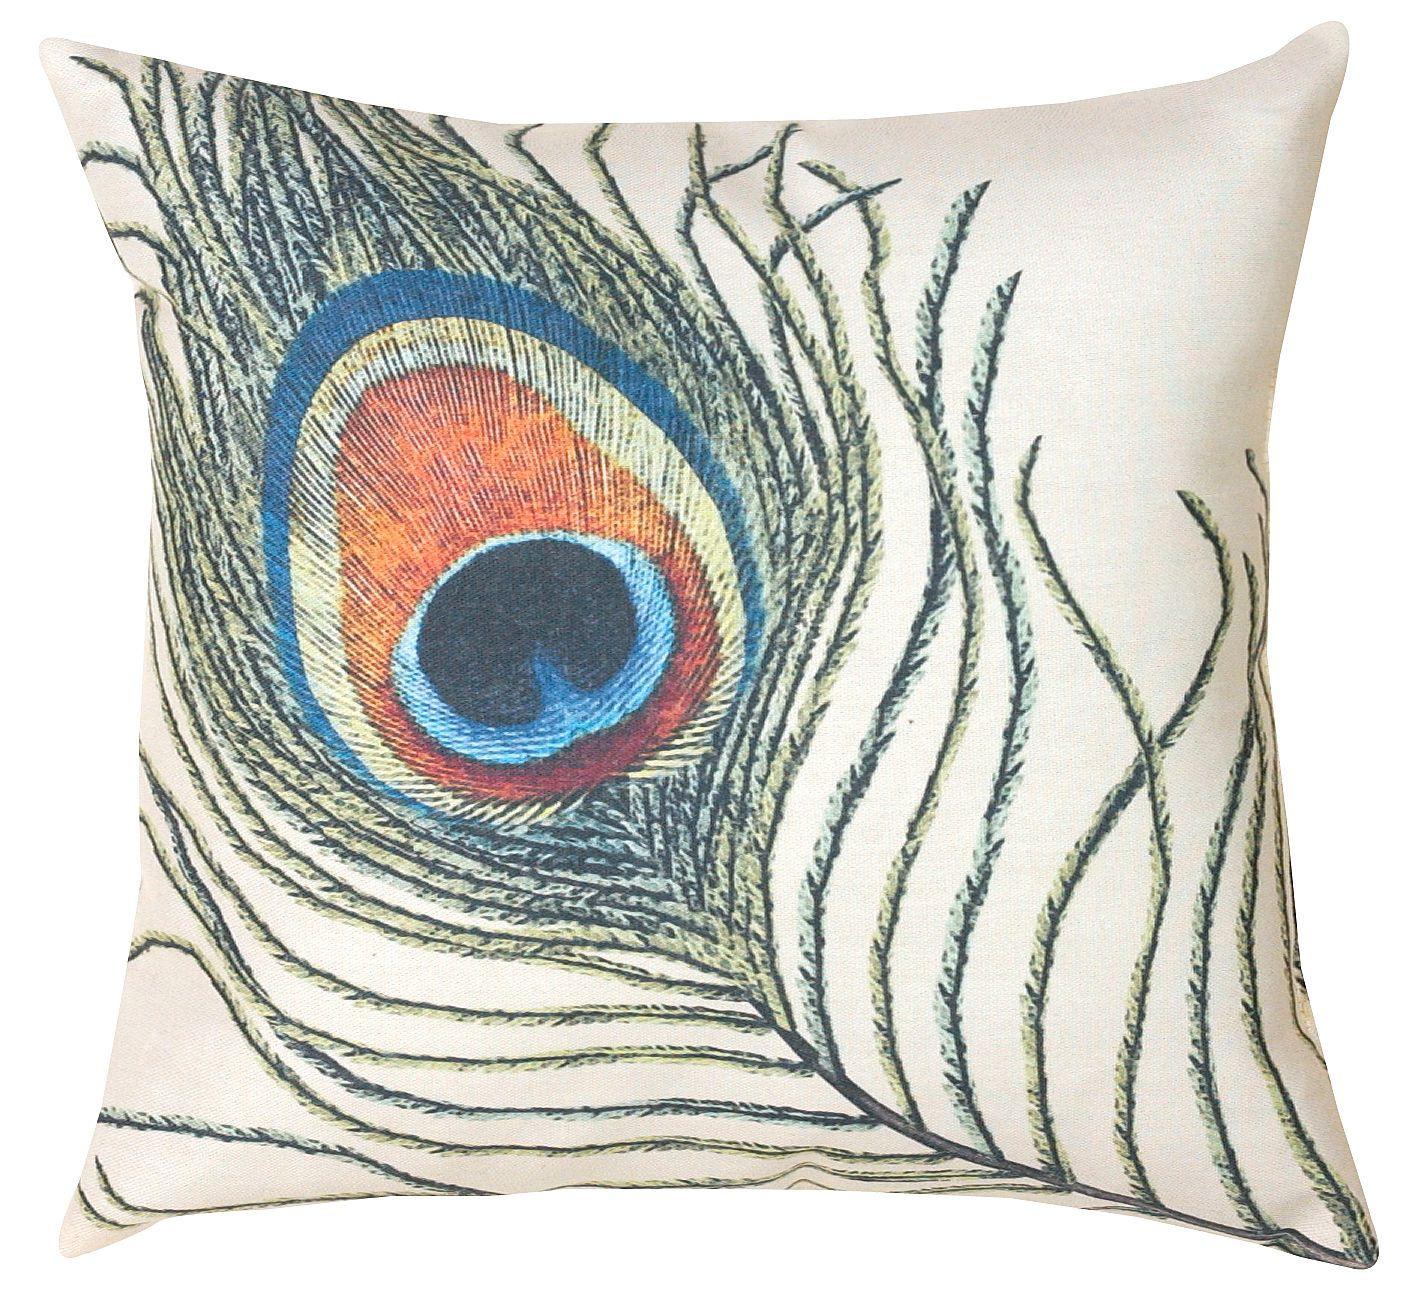 Peacock Feathers Decorative Pillow Pillows Peacock Pillow